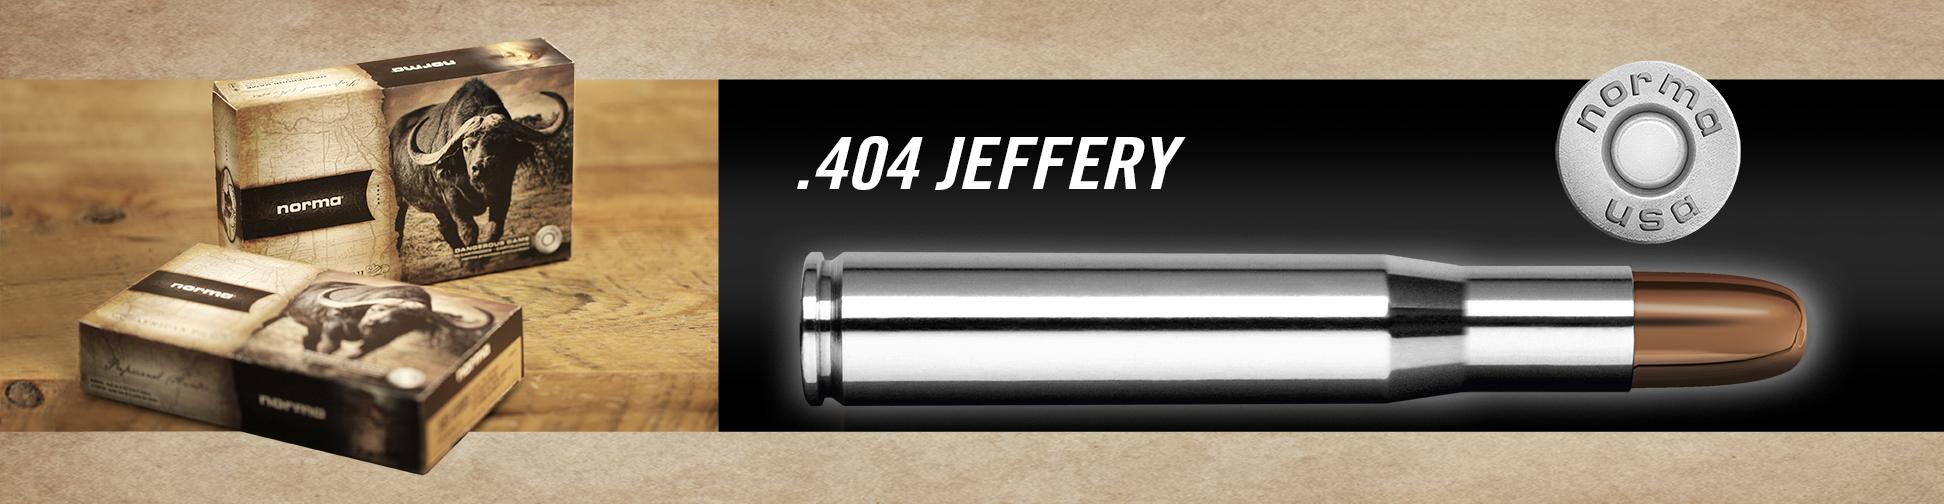 404-JEFF.jpg